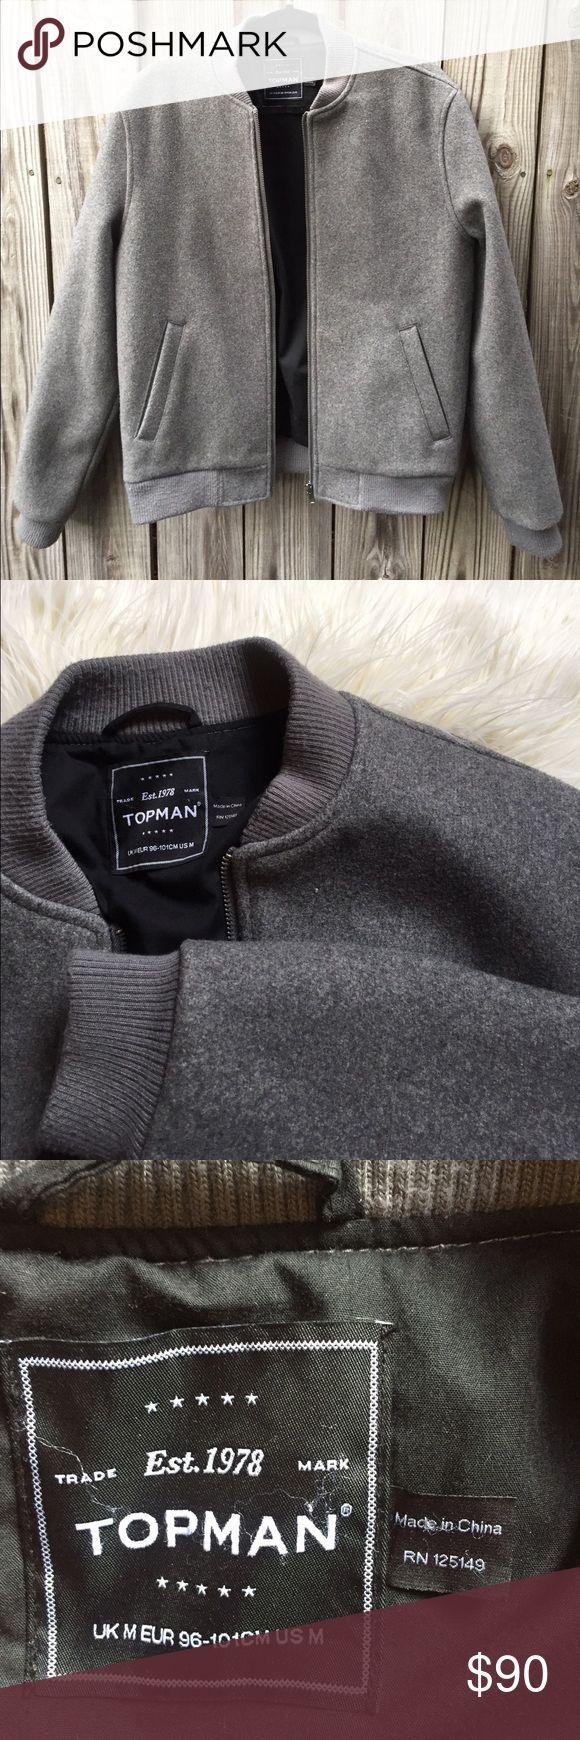 Topman Varsity Jacket Topman grey wool varsity men's jacket. Brand new perfect condition. Men's size medium. Two pockets and black lined. Topman Jackets & Coats Bomber & Varsity